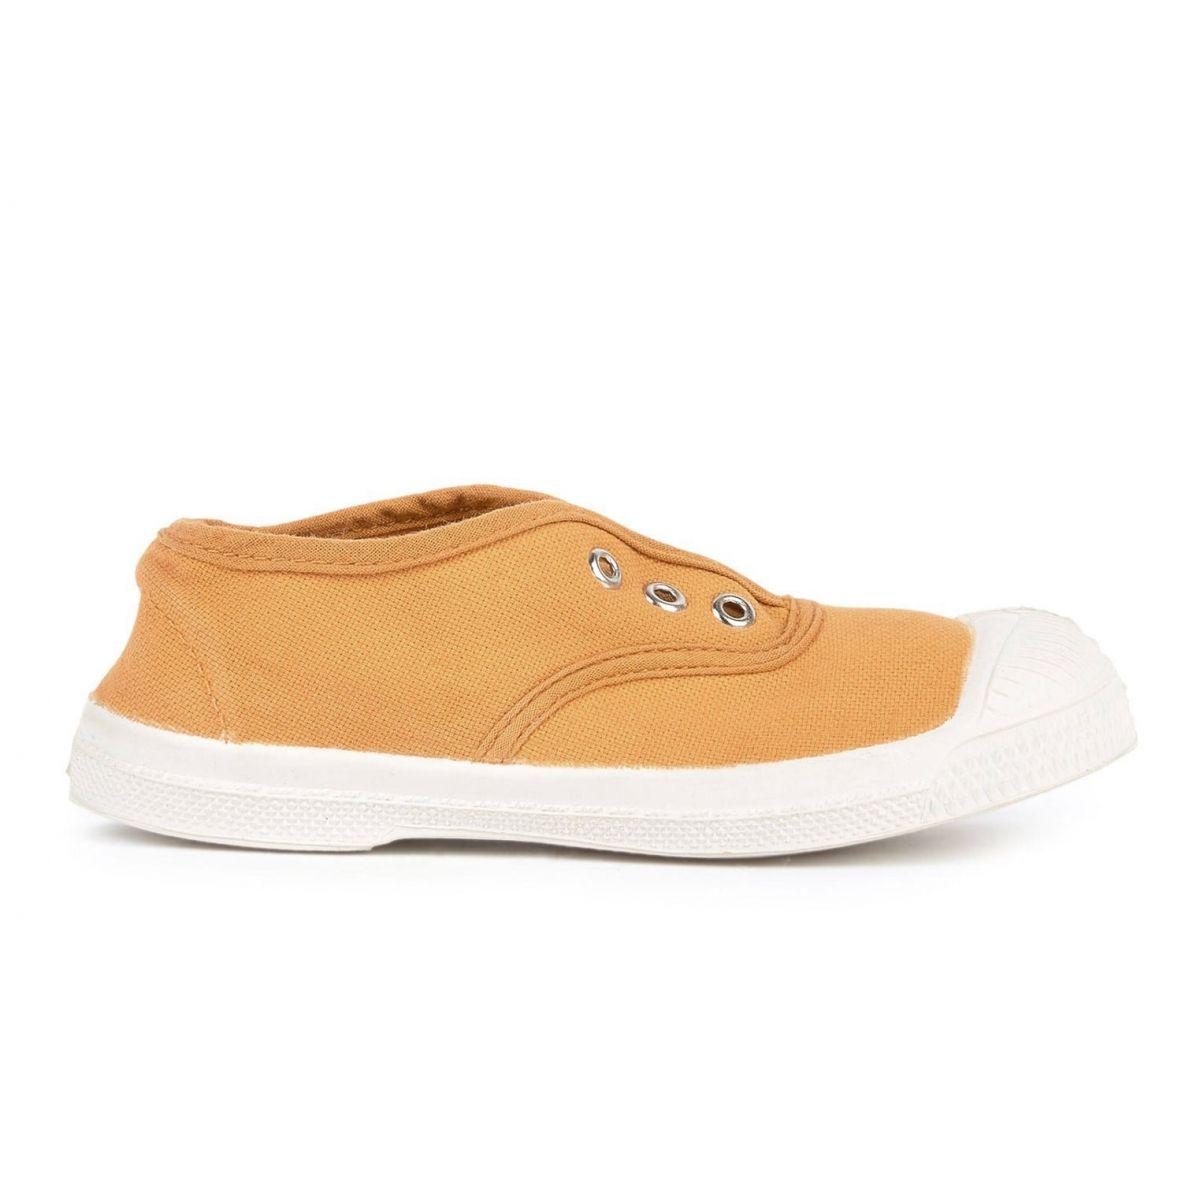 Elly sneakers KID yellow earth - Bensimon